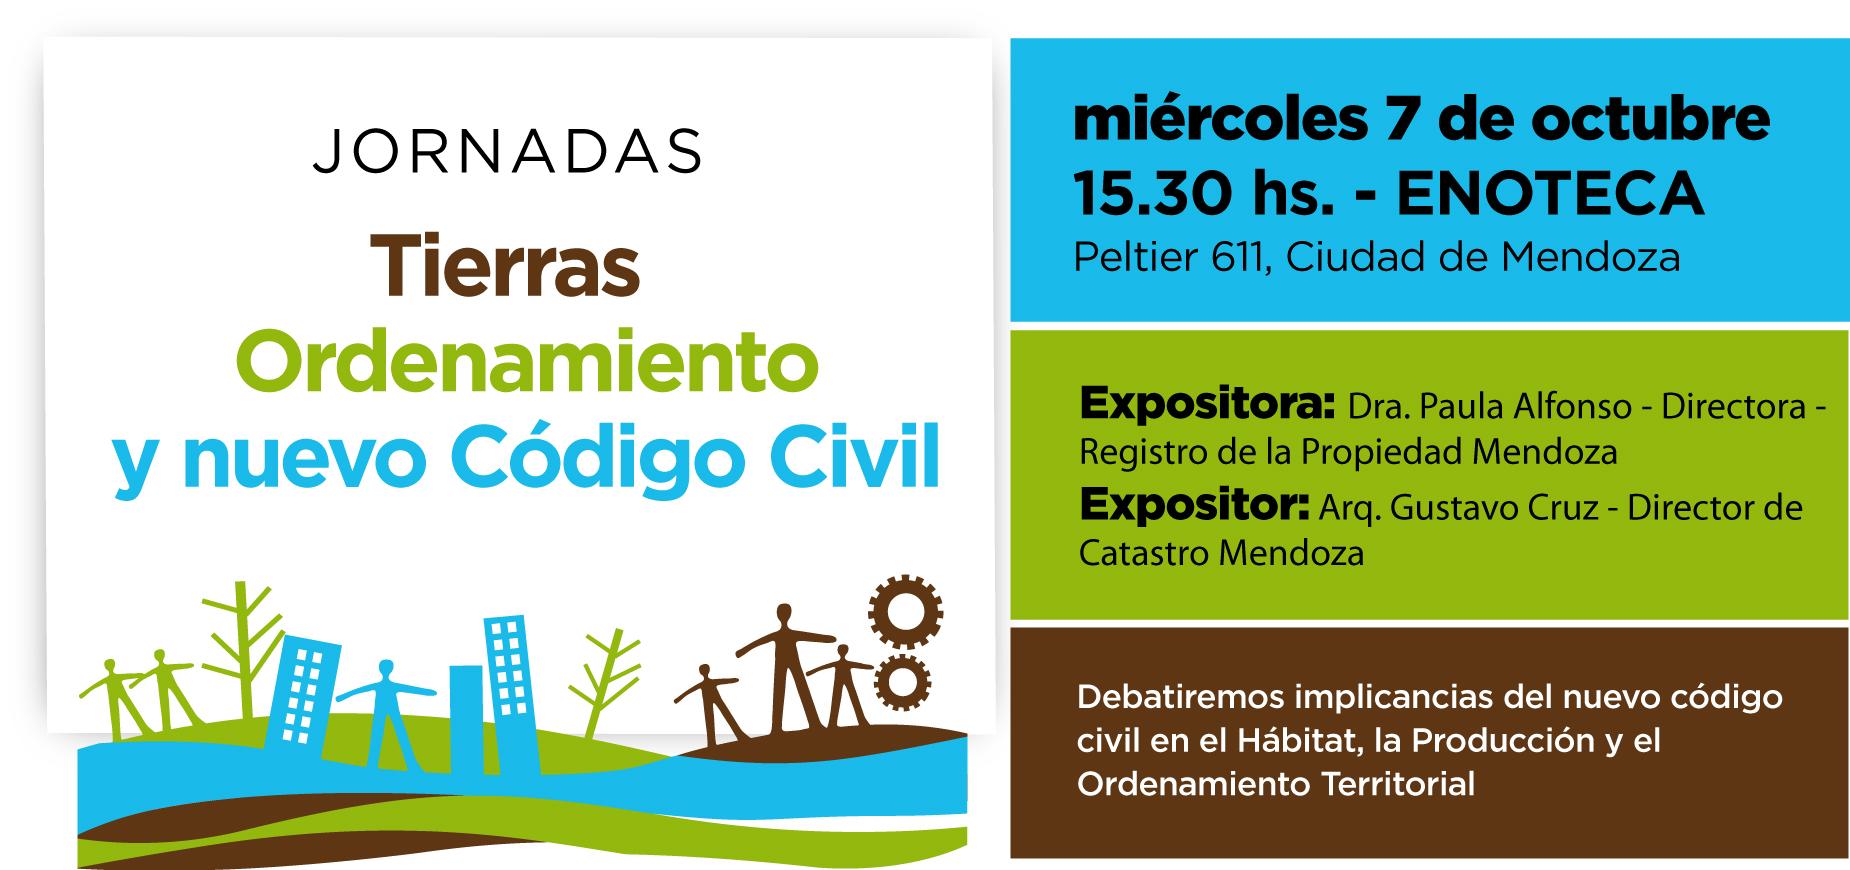 JORNADAS TIERRA ORDENAMIENTO CODIGO -  1º jornada